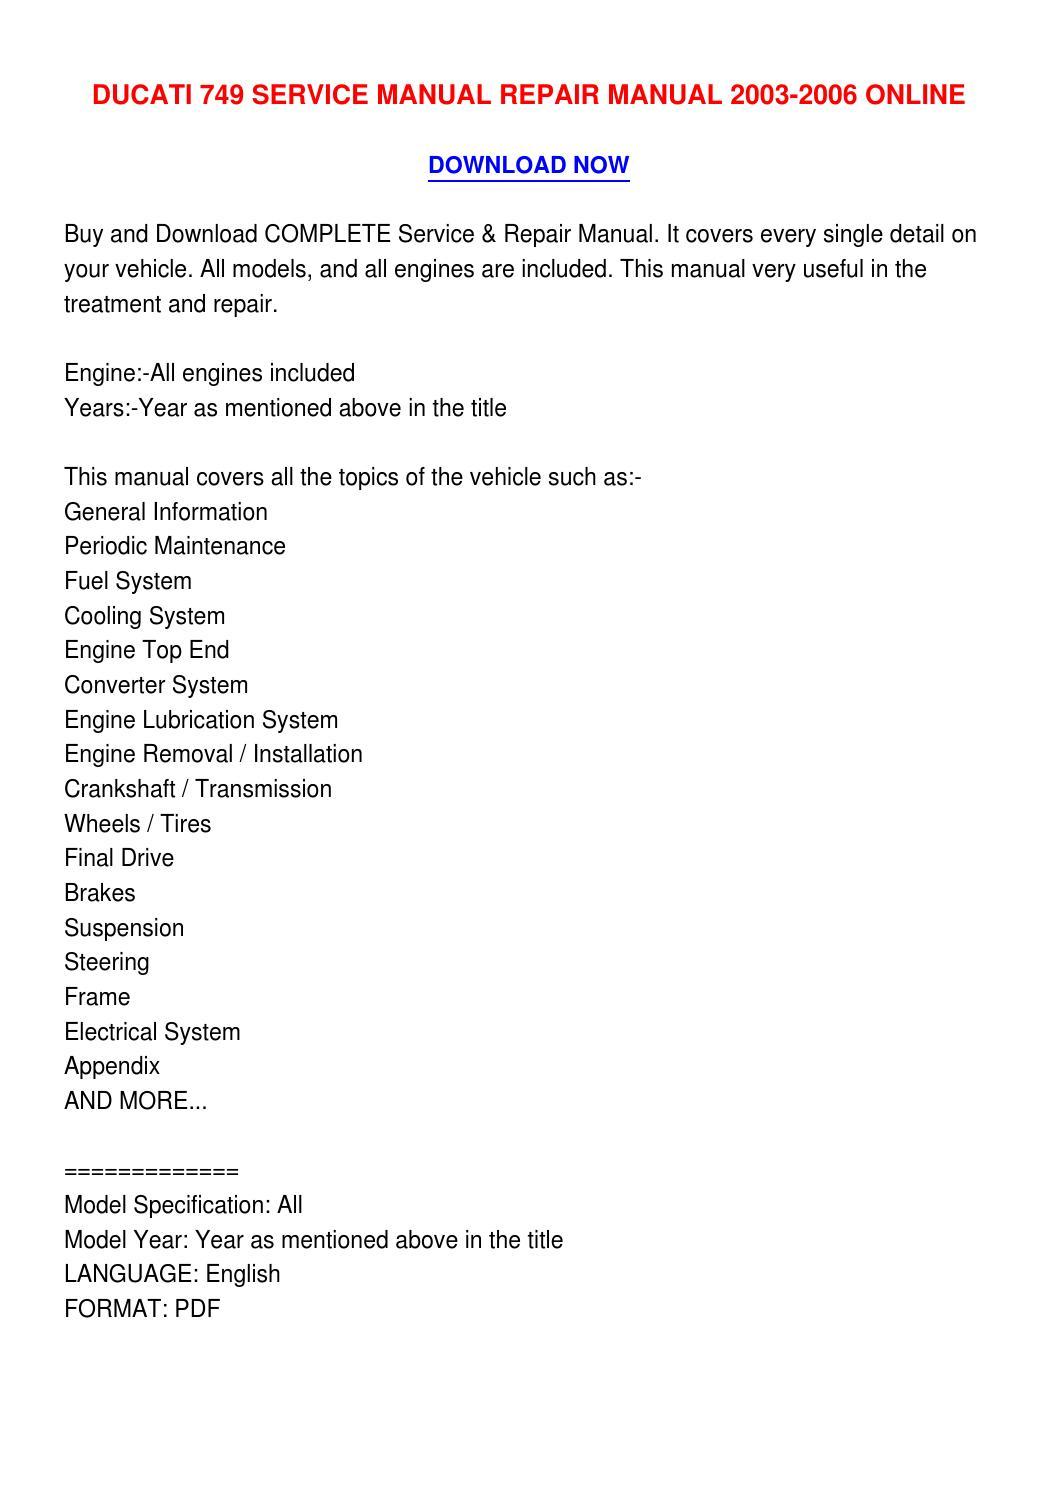 Ducati 749 service manual repair manual 2003 2006 online by  catherinemonsonvhav - issuu